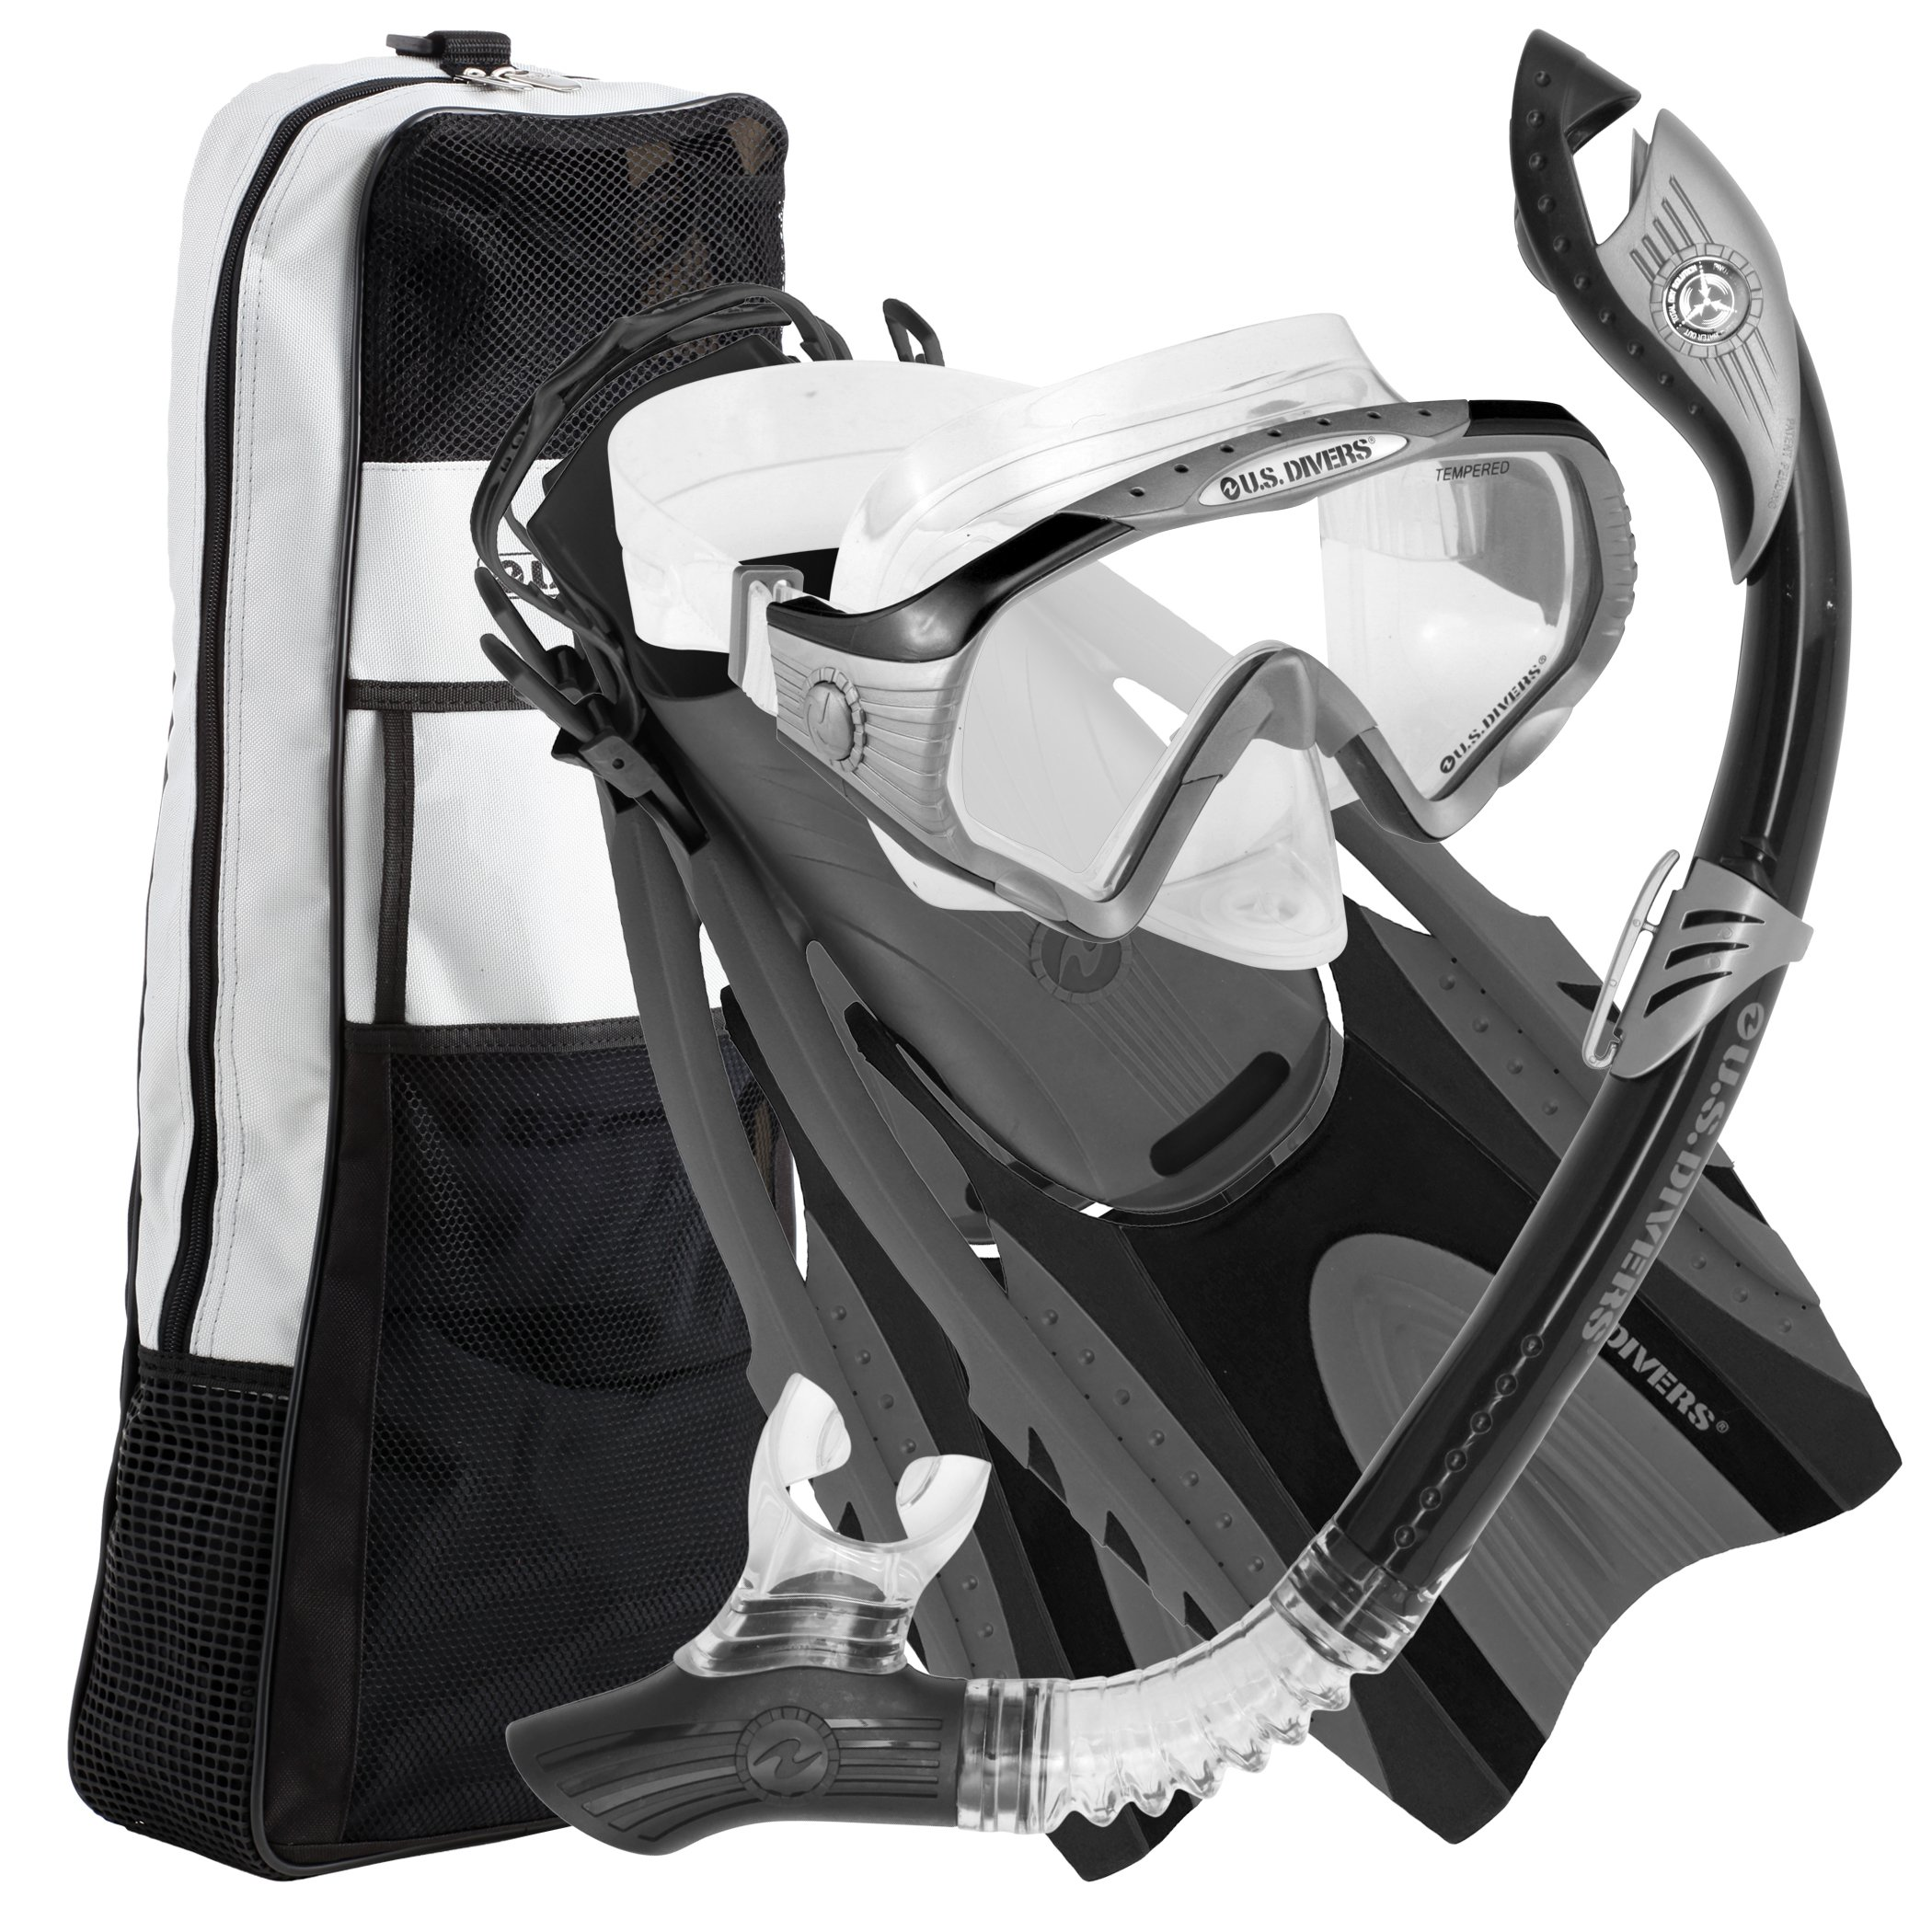 U.S. Divers Purge Mask, Hingeflex Fins, Dry Snorkel Set, with Snorkeling Gear Bag, BK-LG by U.S. Divers